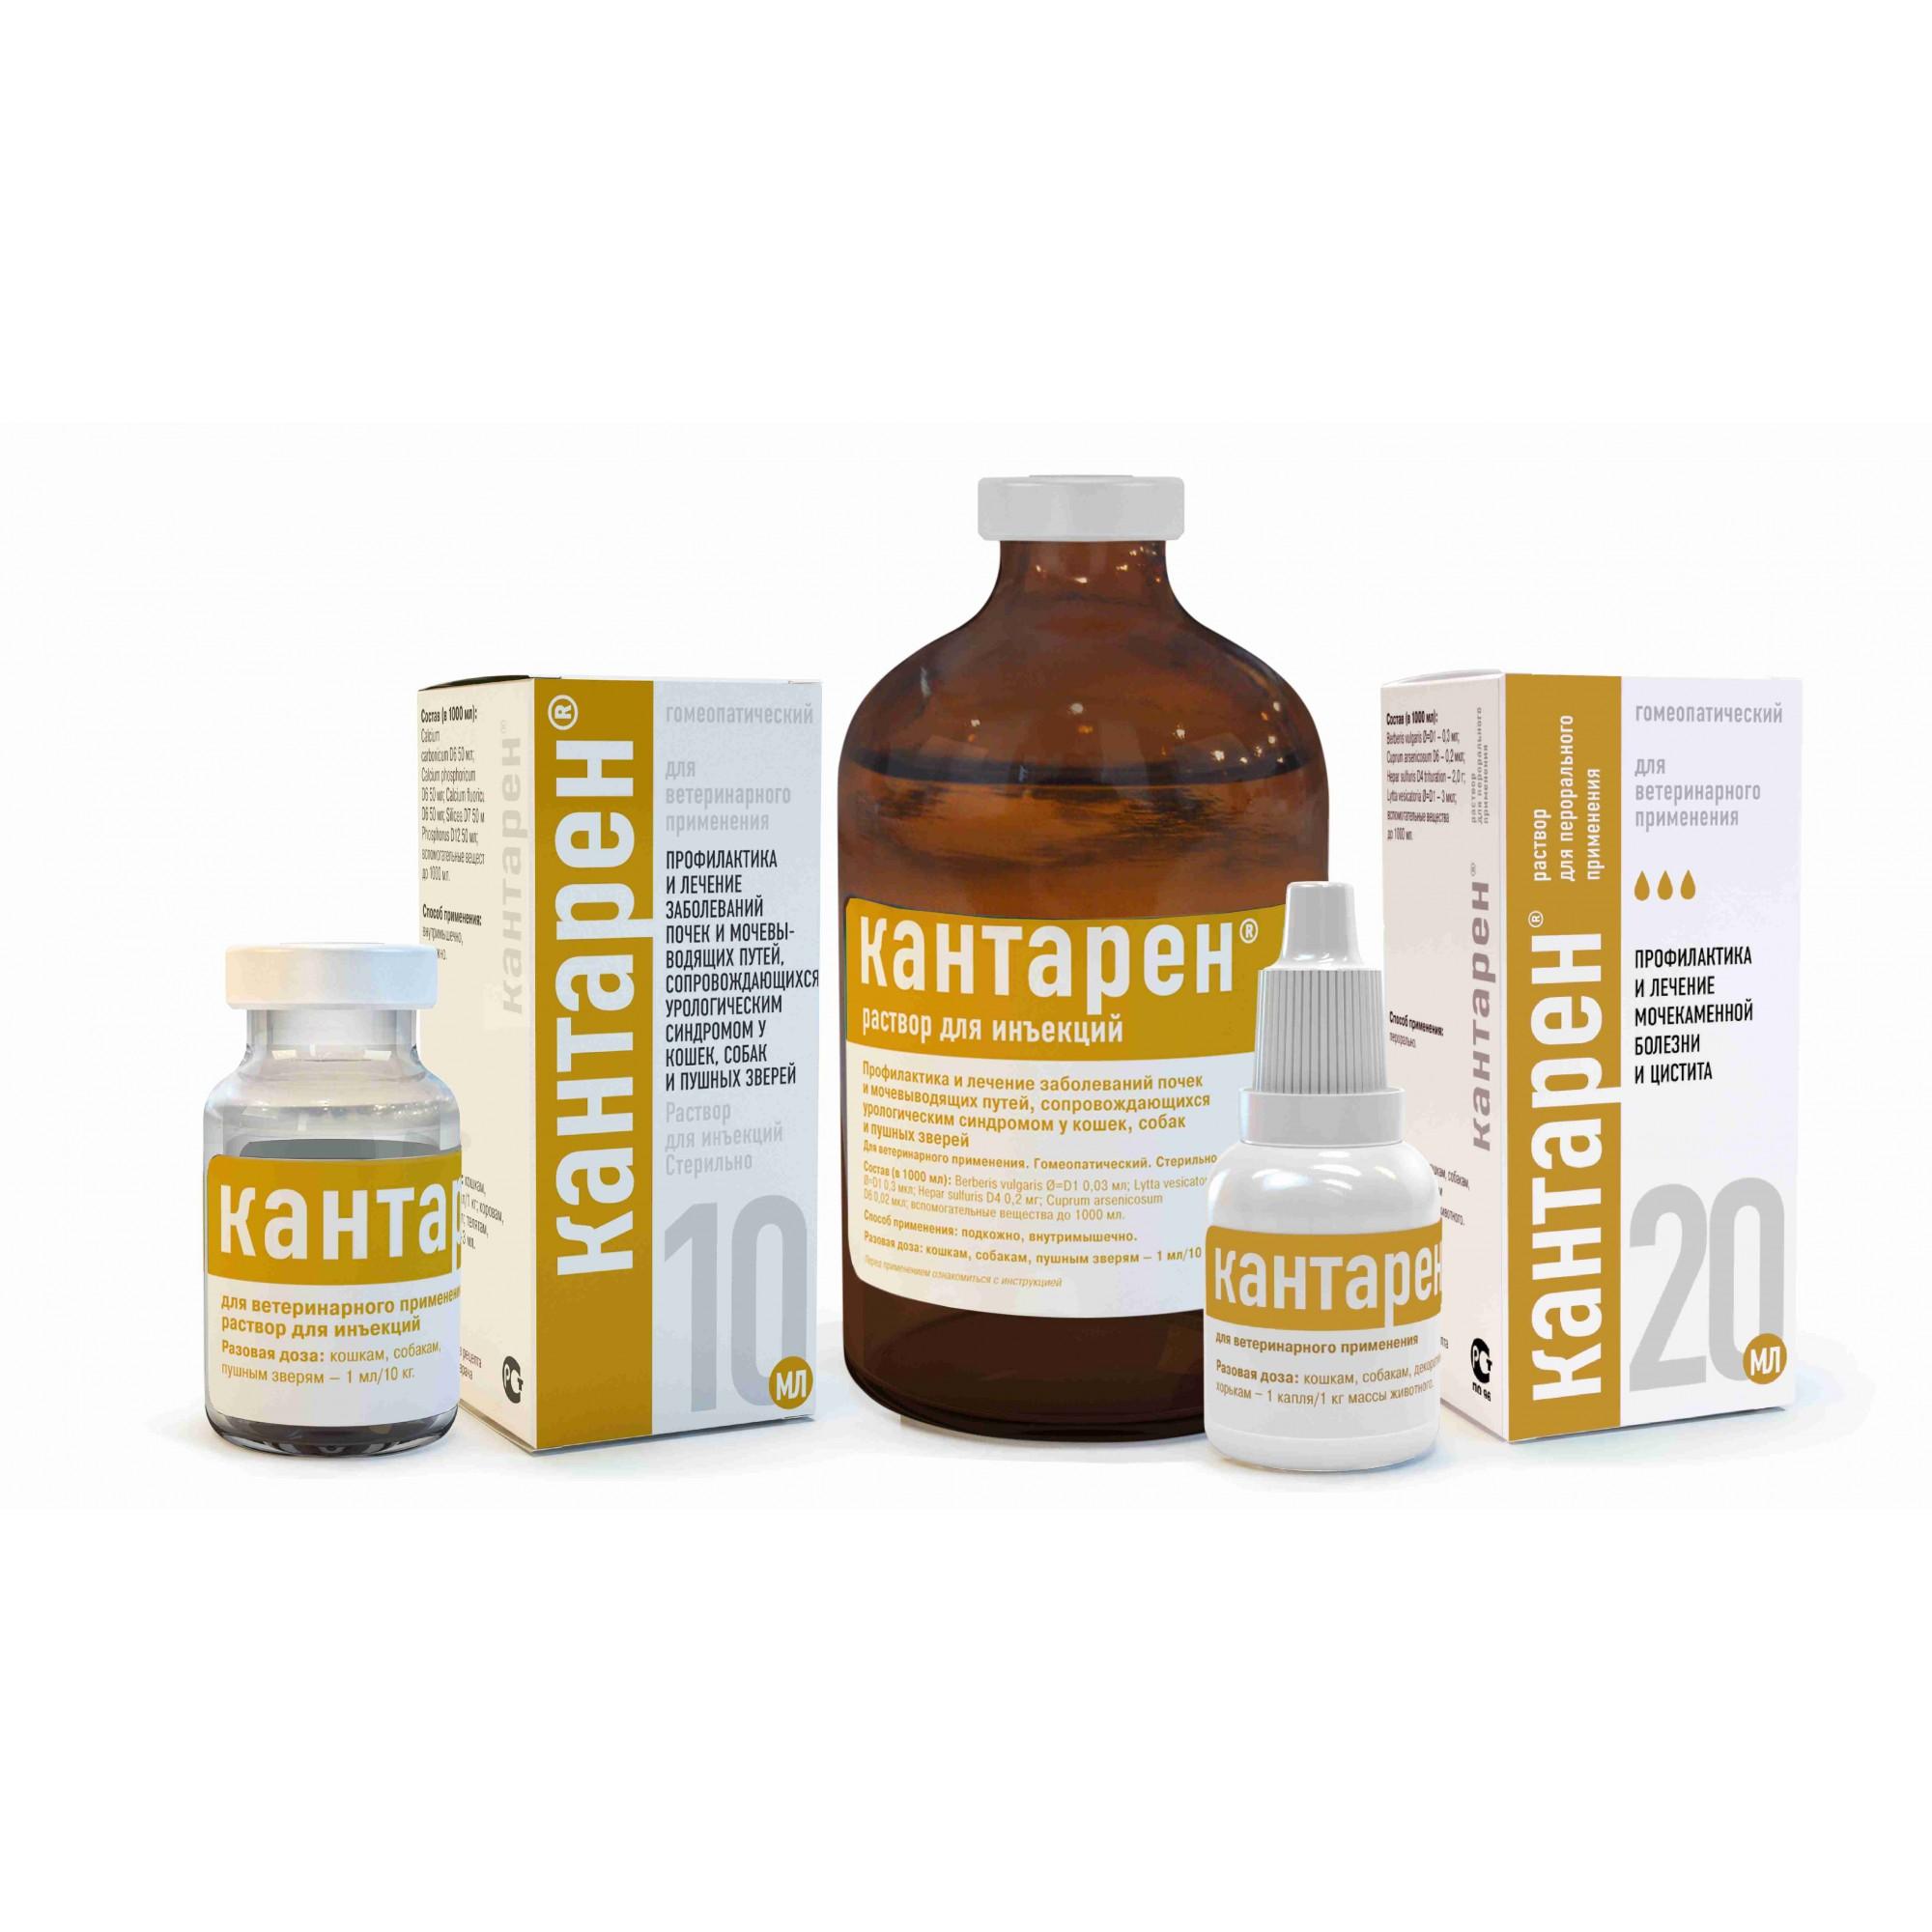 Кантарен® - препарат для профилактики и лечения мочекаменной болезни и цистита